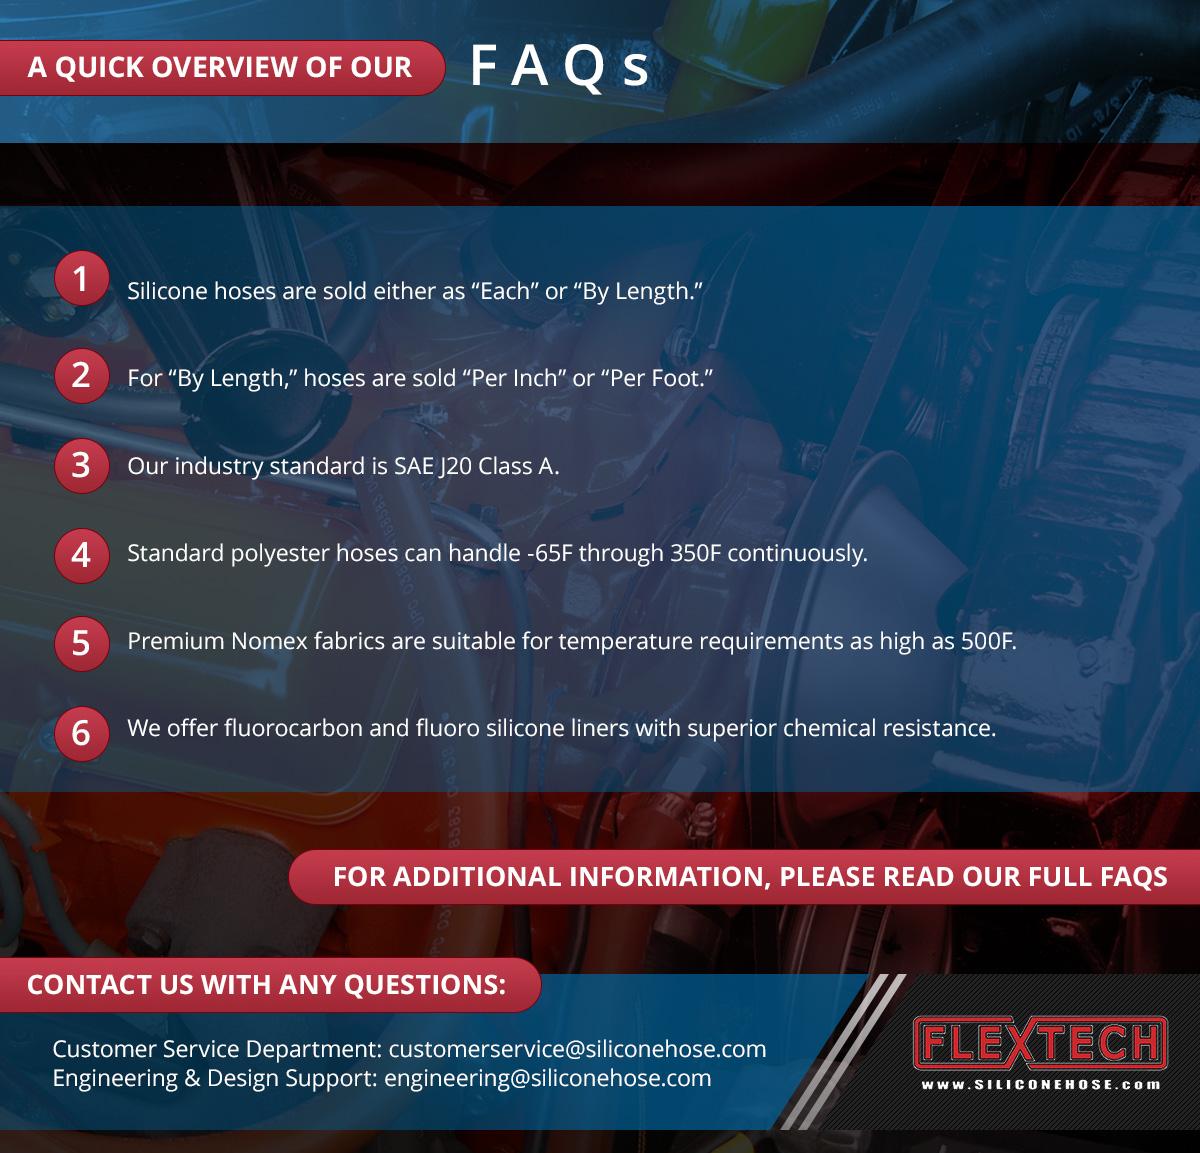 faq-infographic.jpg